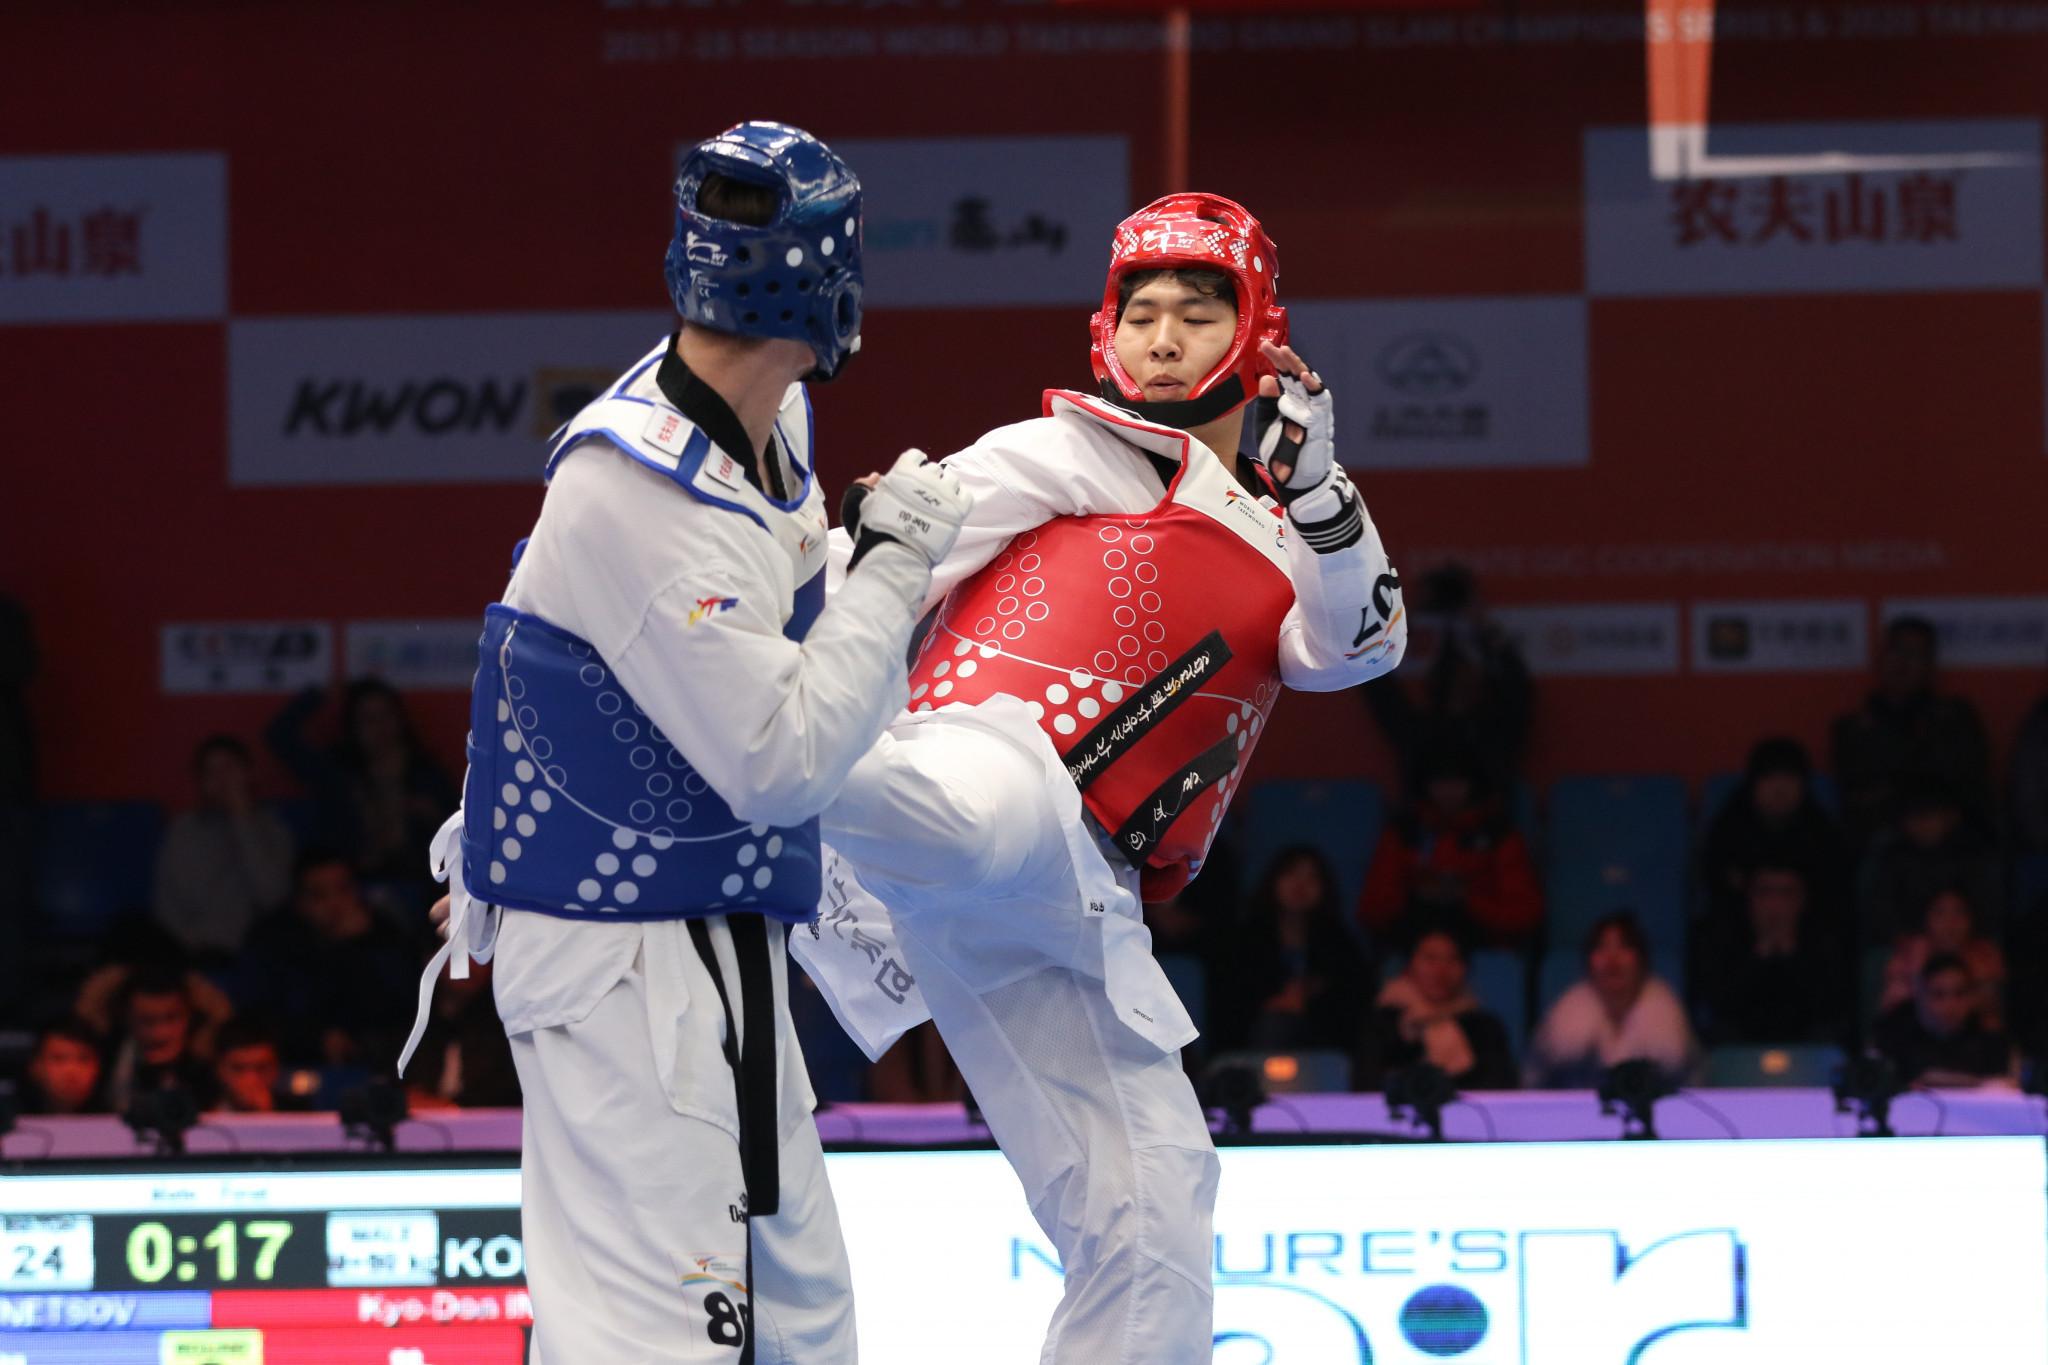 Wuxi is the host and sponsor of the World Taekwondo Grand Slam Champions Series ©World Taekwondo